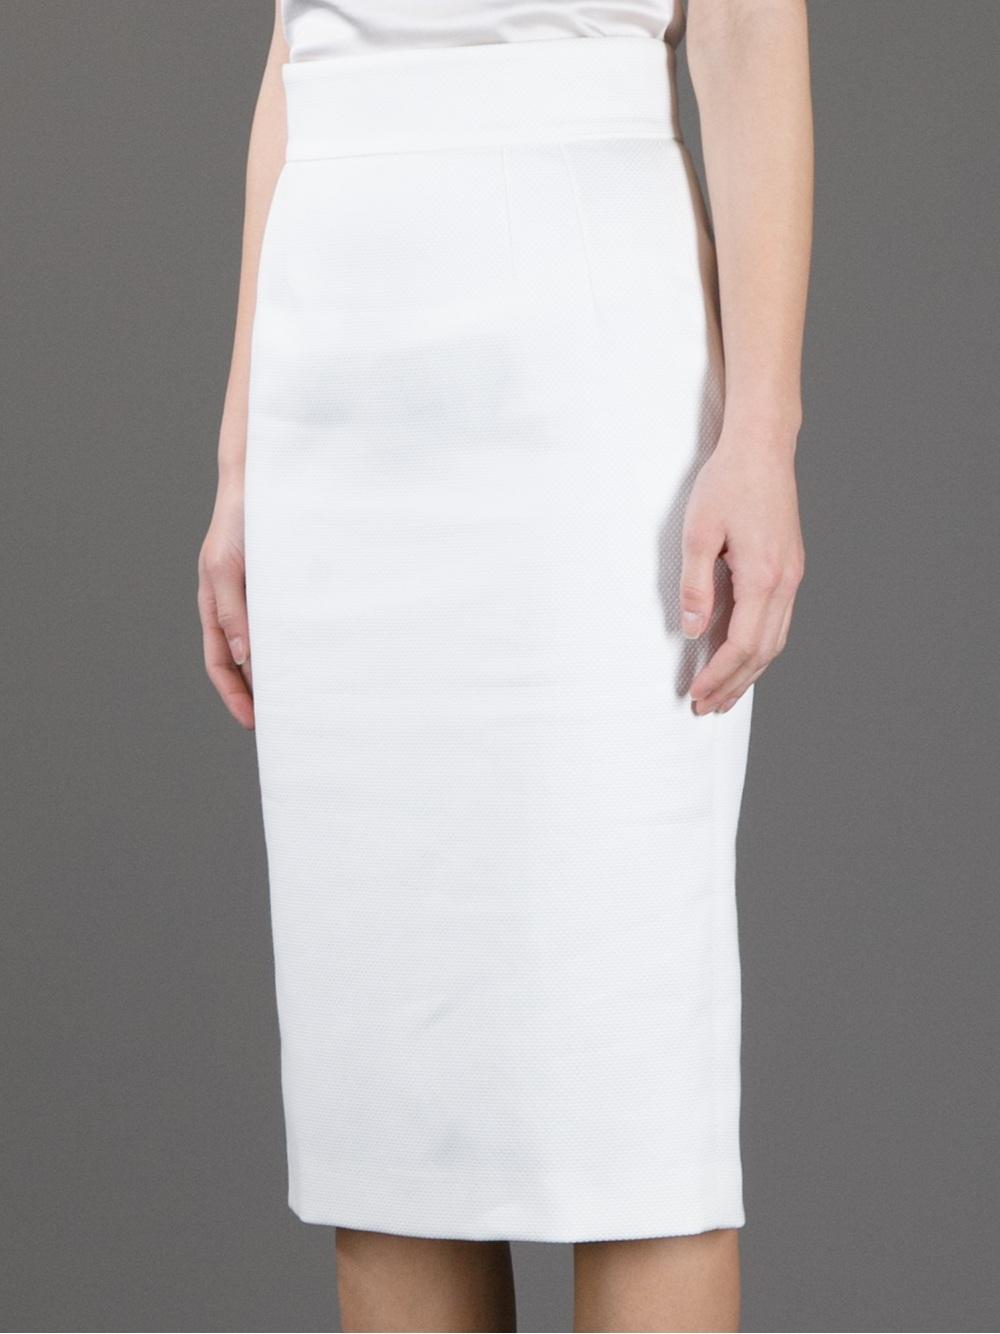 dolce gabbana pencil skirt in white lyst